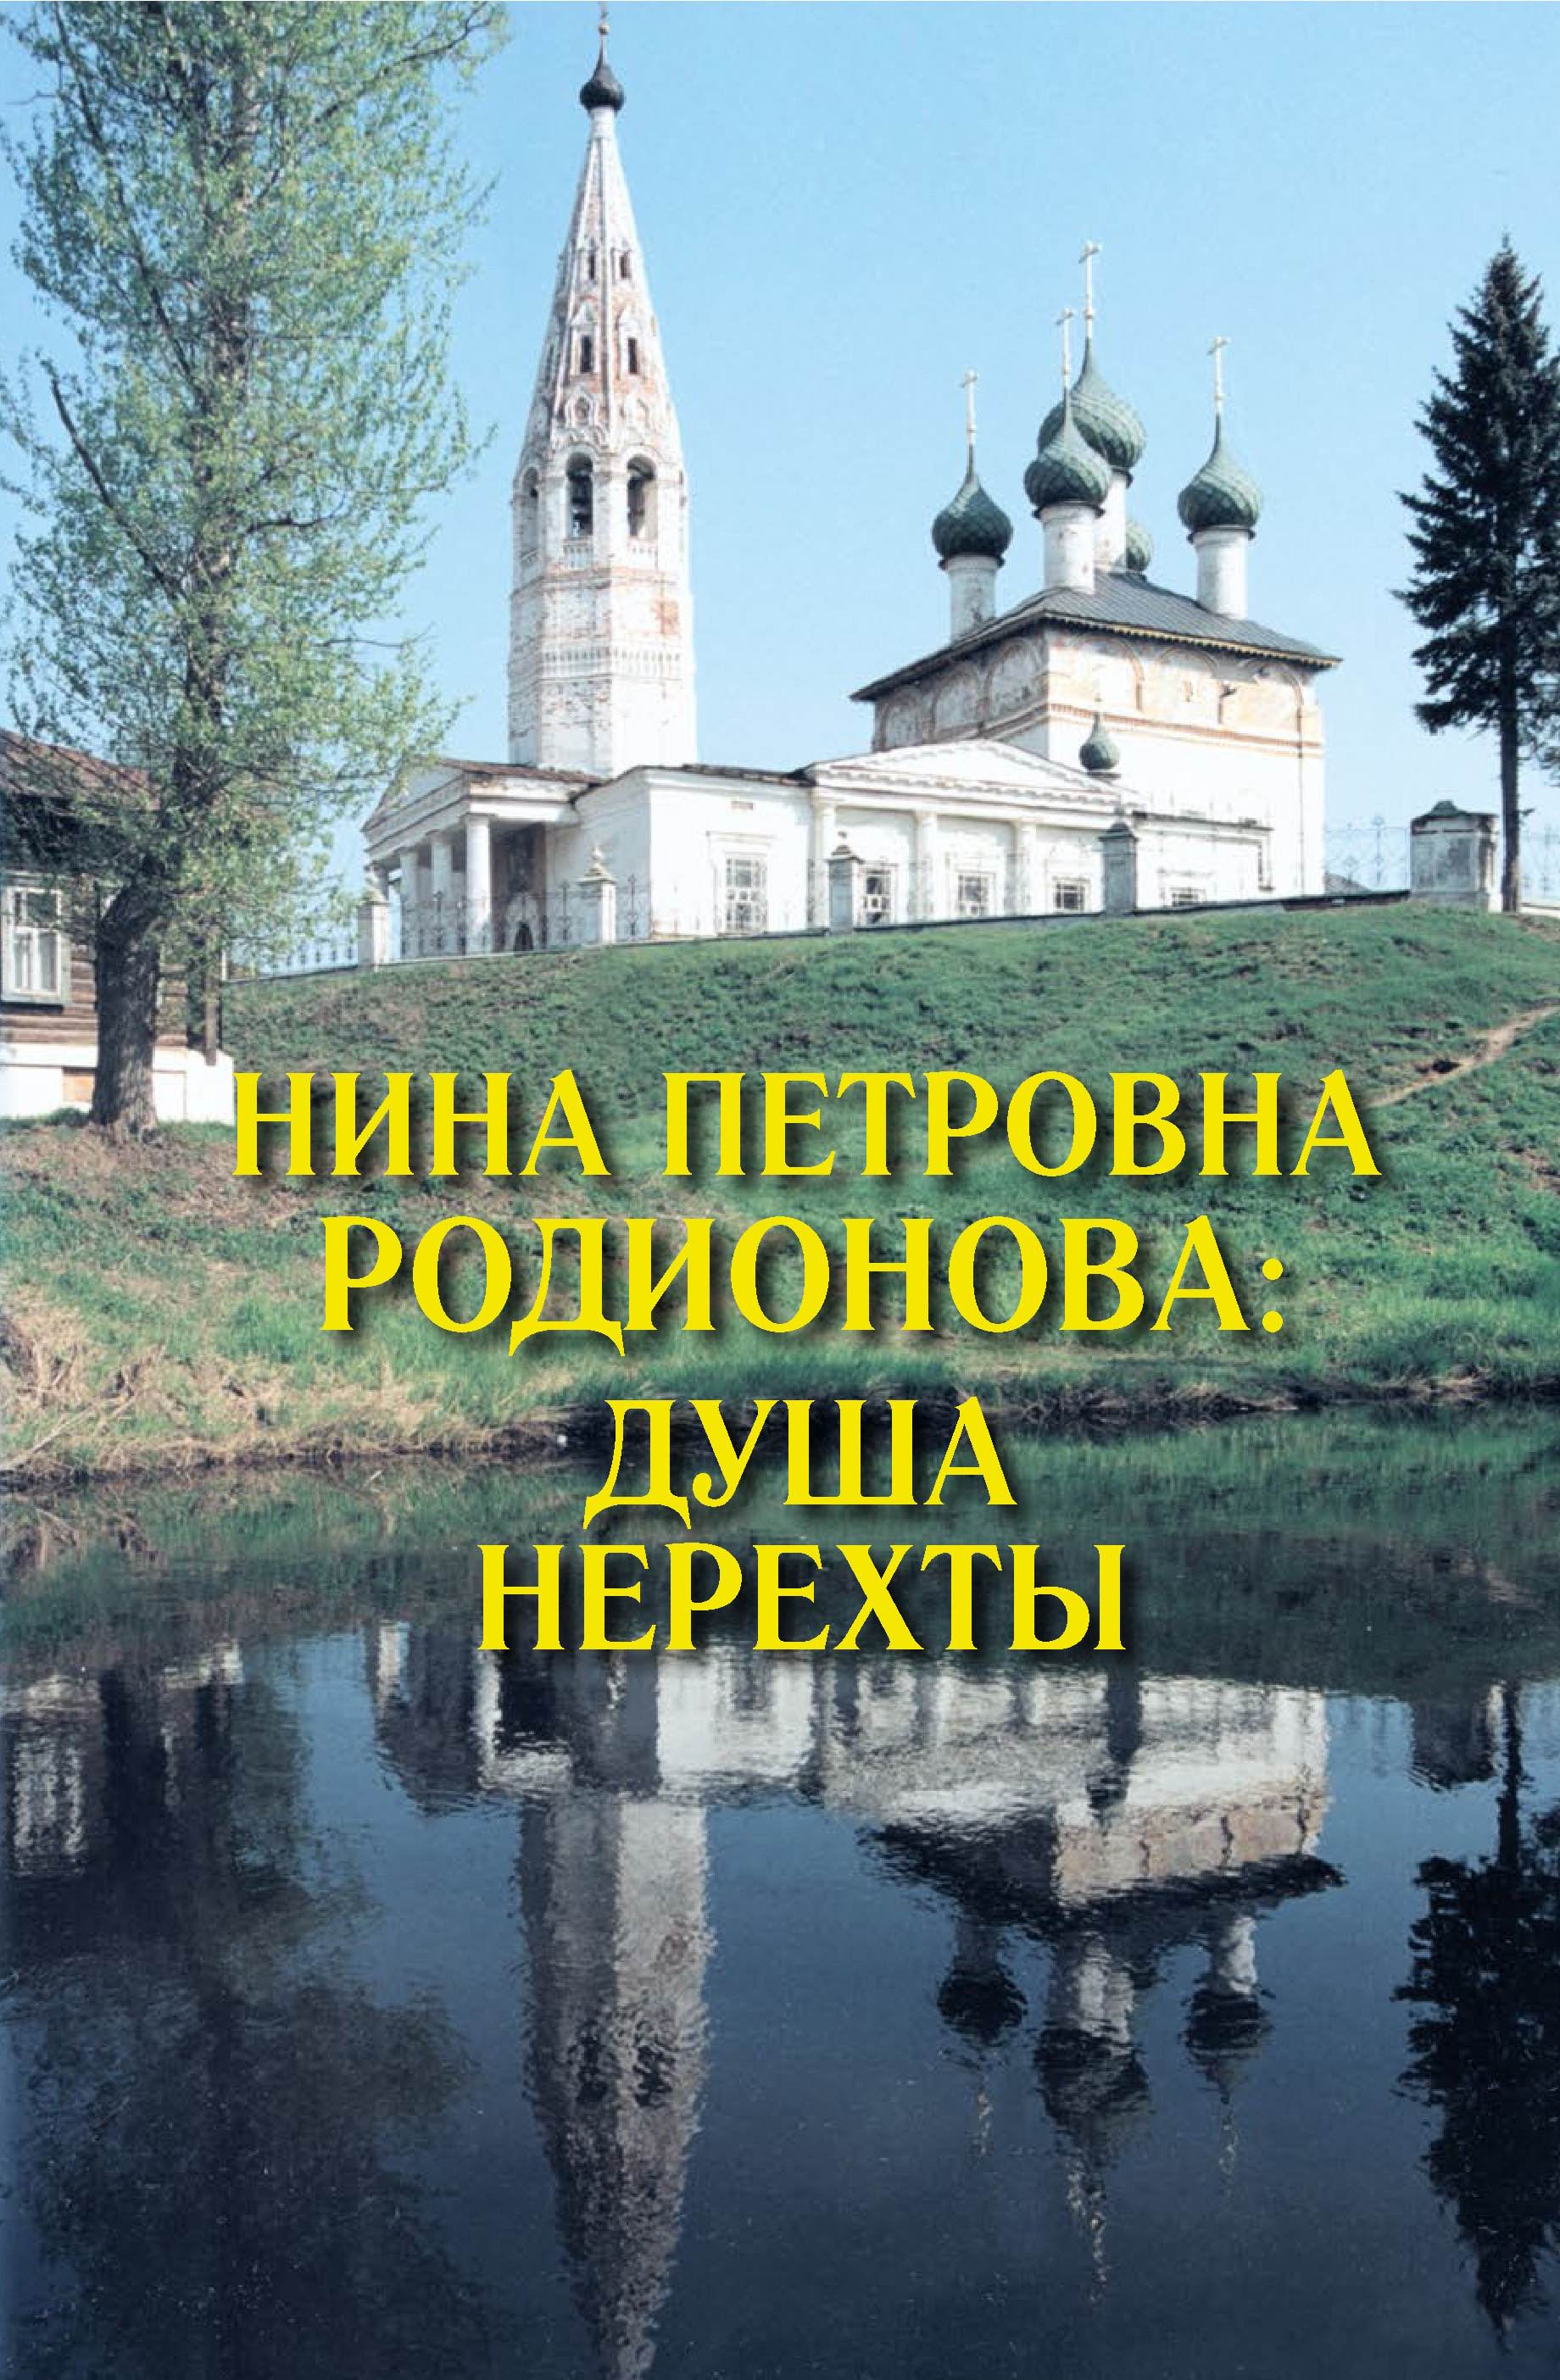 Нина Петровна Родионова: душа Нерехты